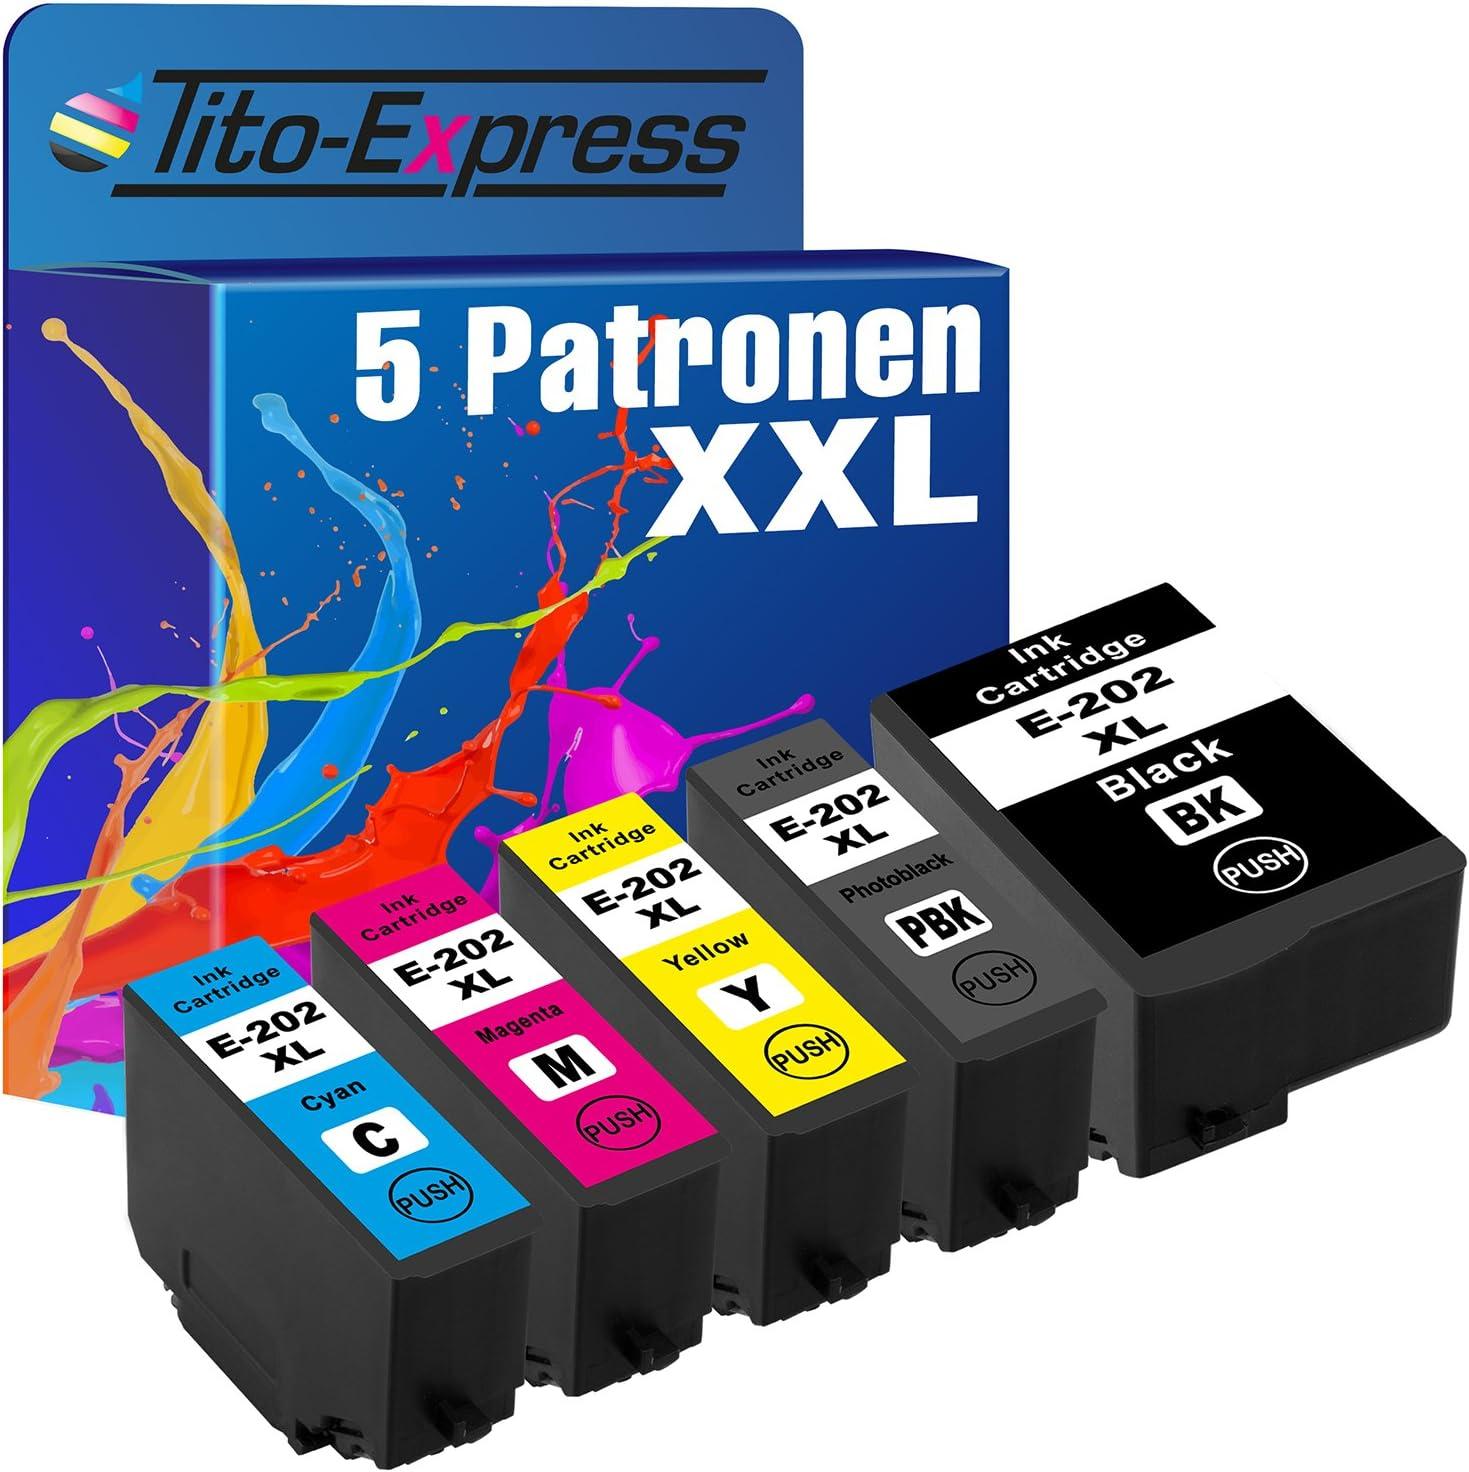 Tito Express Platinumserie 5x Tinten Patrone Xxl Passend Zu Epson 202xl 202 Xl Kompatibel Mit Expression Premium Xp 6000 Xp6000 6005 Xp6005 6100 Xp6100 6105 Xp6105 Black 16ml Color Je 10ml Bürobedarf Schreibwaren